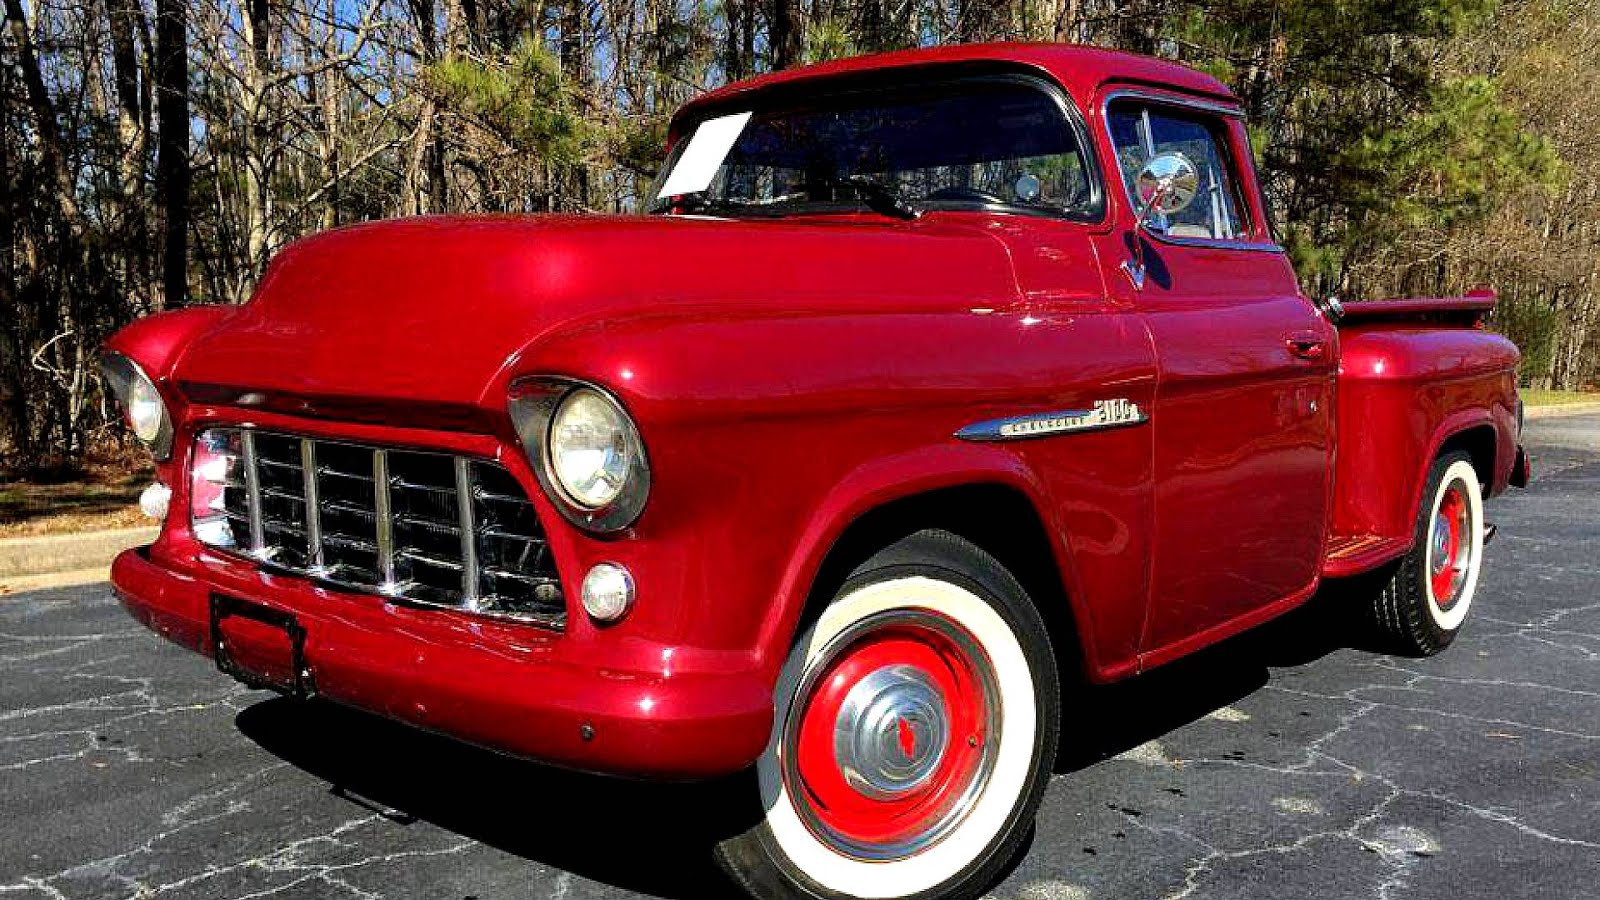 Craigslist Atlanta Cars Trucks Owner - Truck Choices